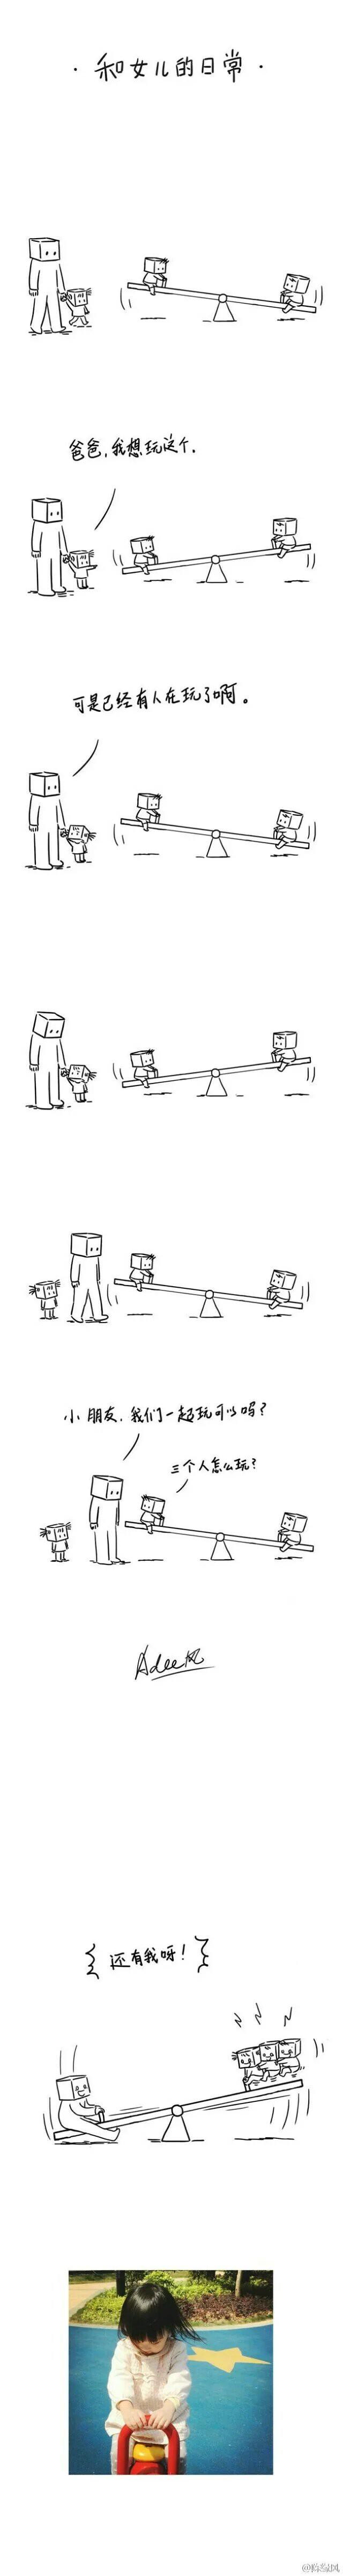 18e21476679900 - 温馨漫画-《和女儿的日常》